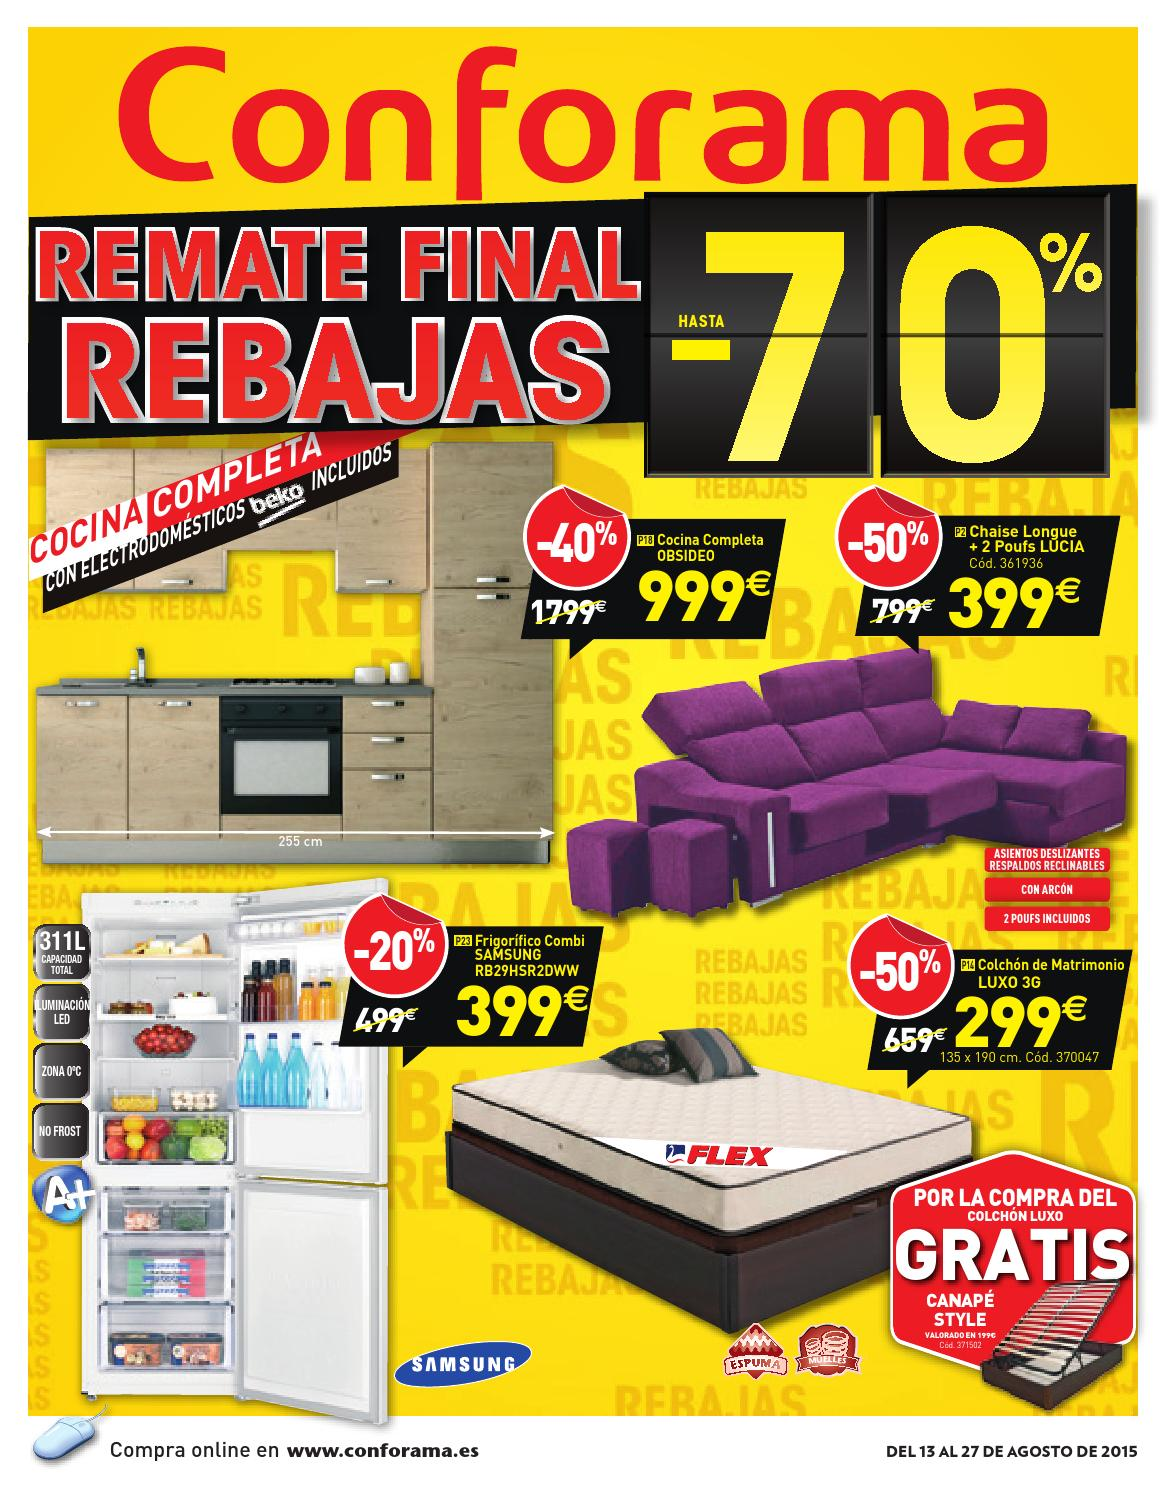 Catalogo de muebles conforama septiembre 2012 by - Catalogo de conforama ...